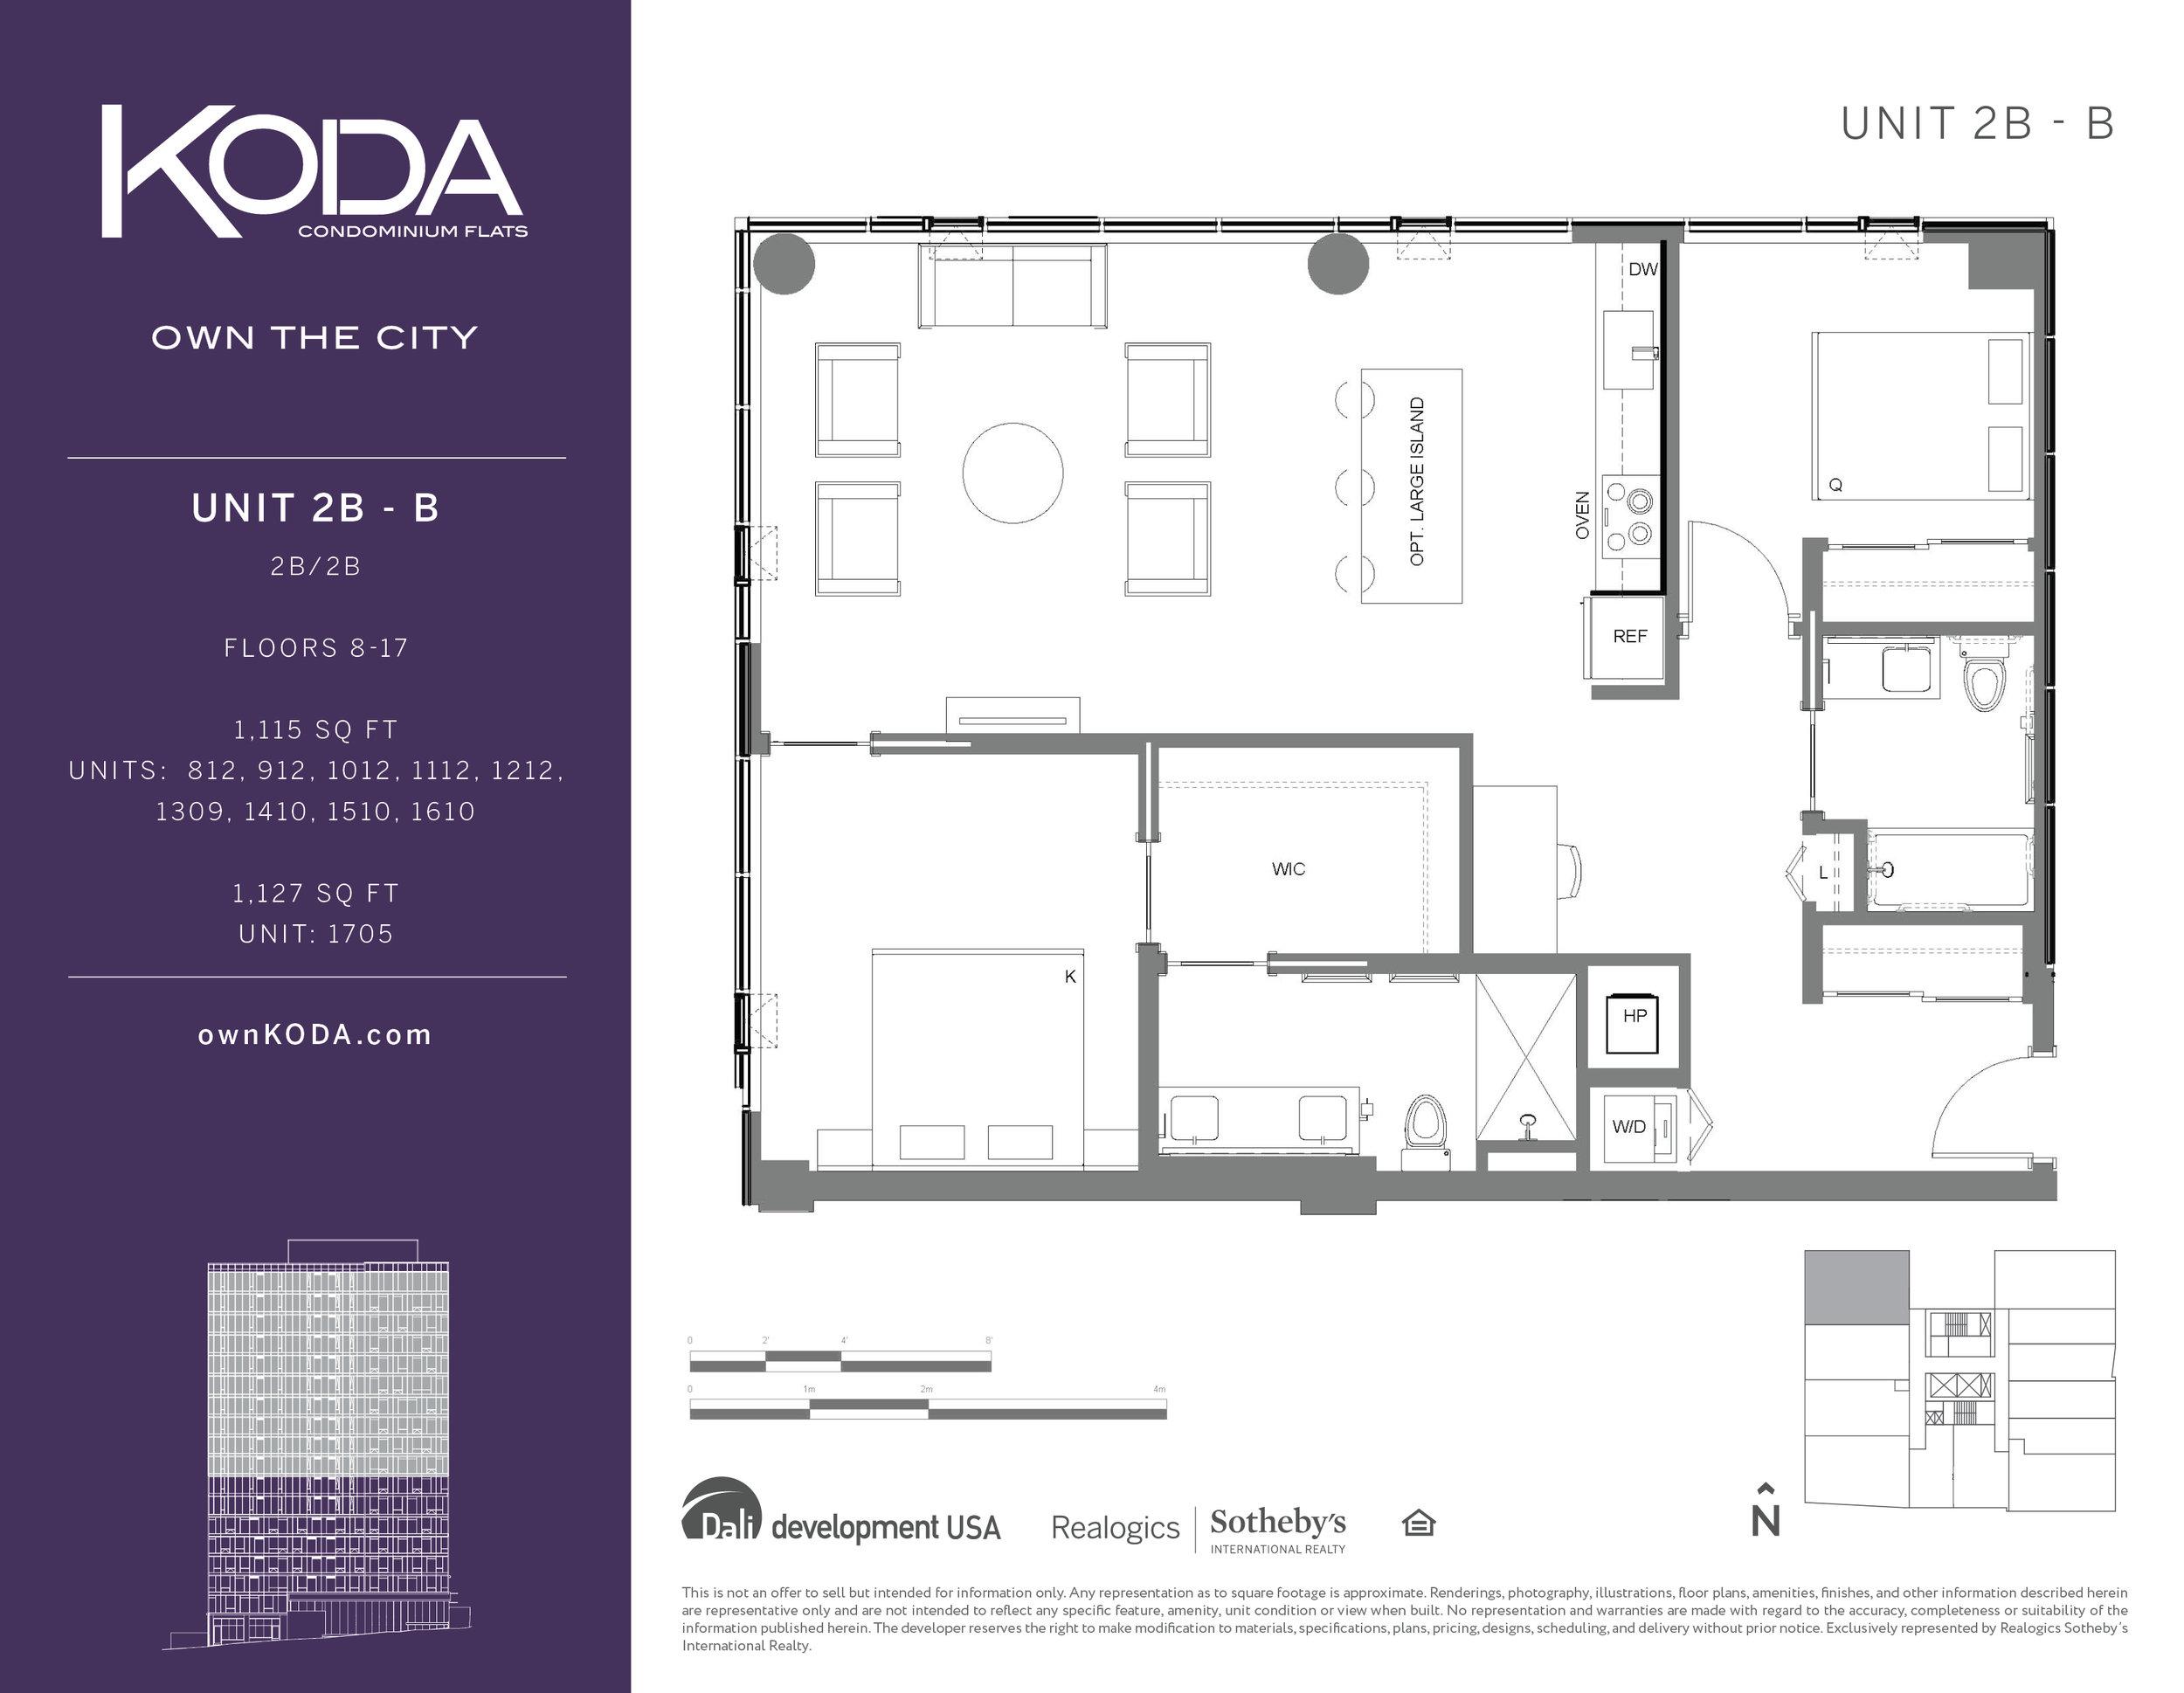 KODA_FloorPlanFlyer_Update_Approved_04.04.19_Release27.jpg